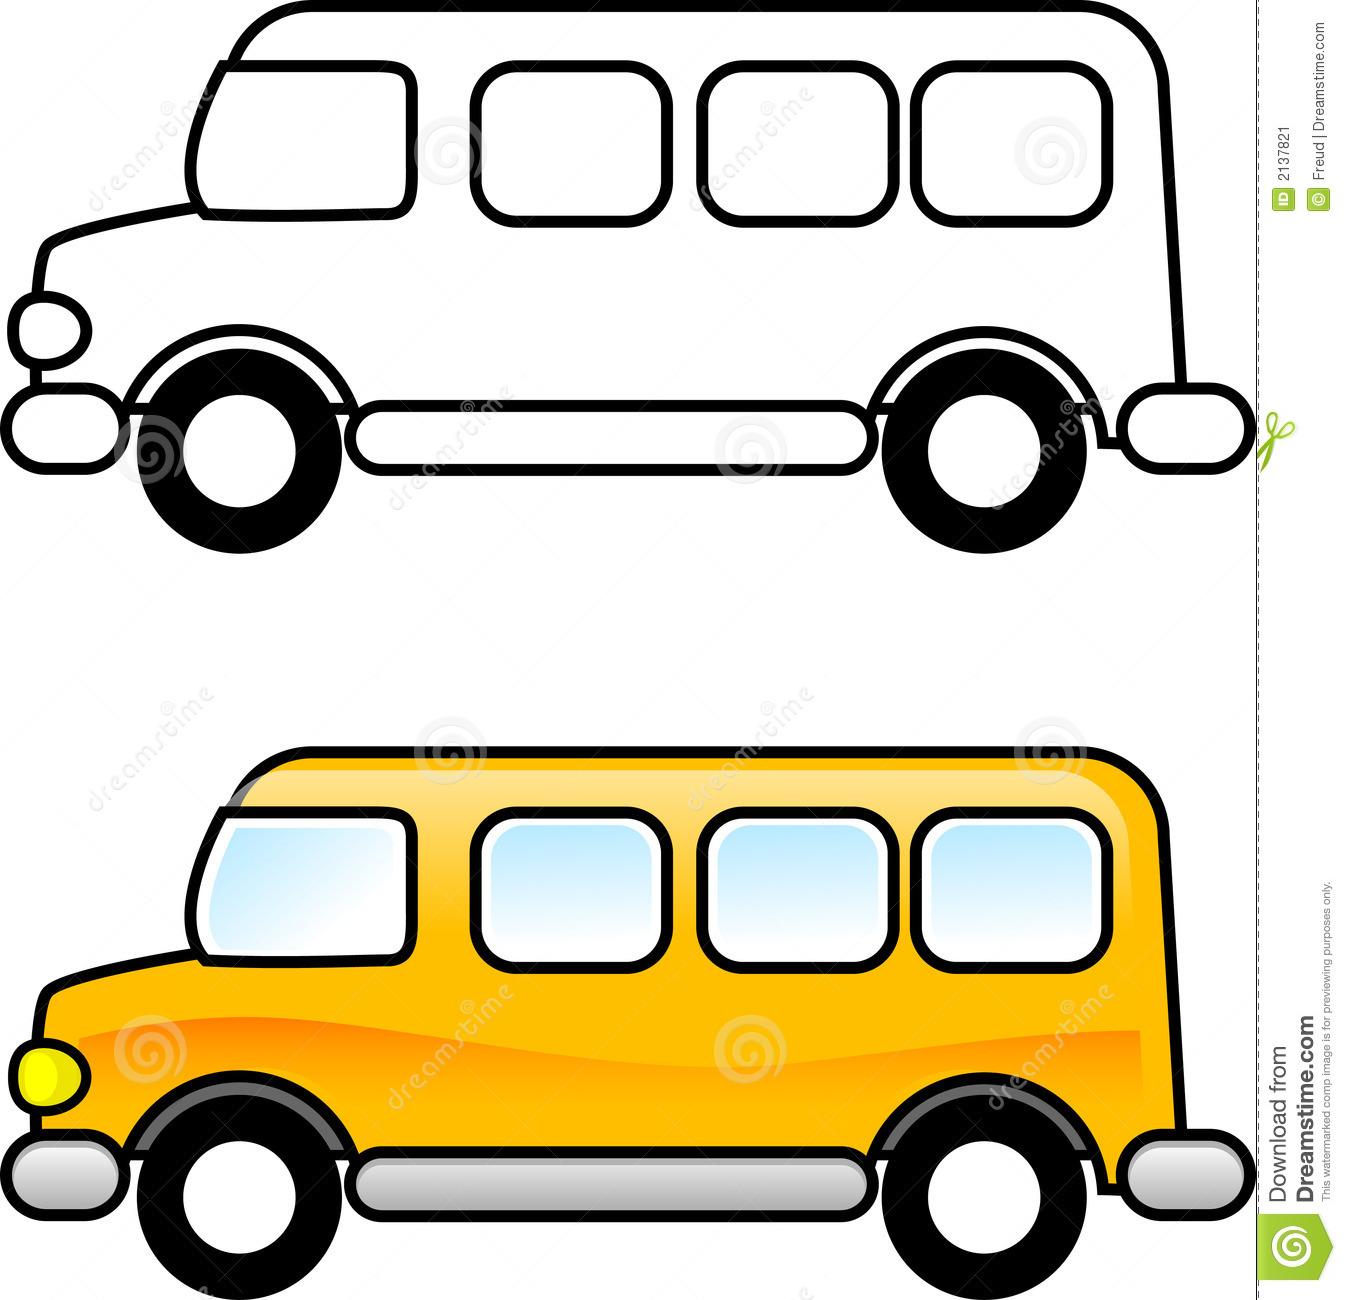 School bus superman clipart stock School bus superman clipart - ClipartFest stock